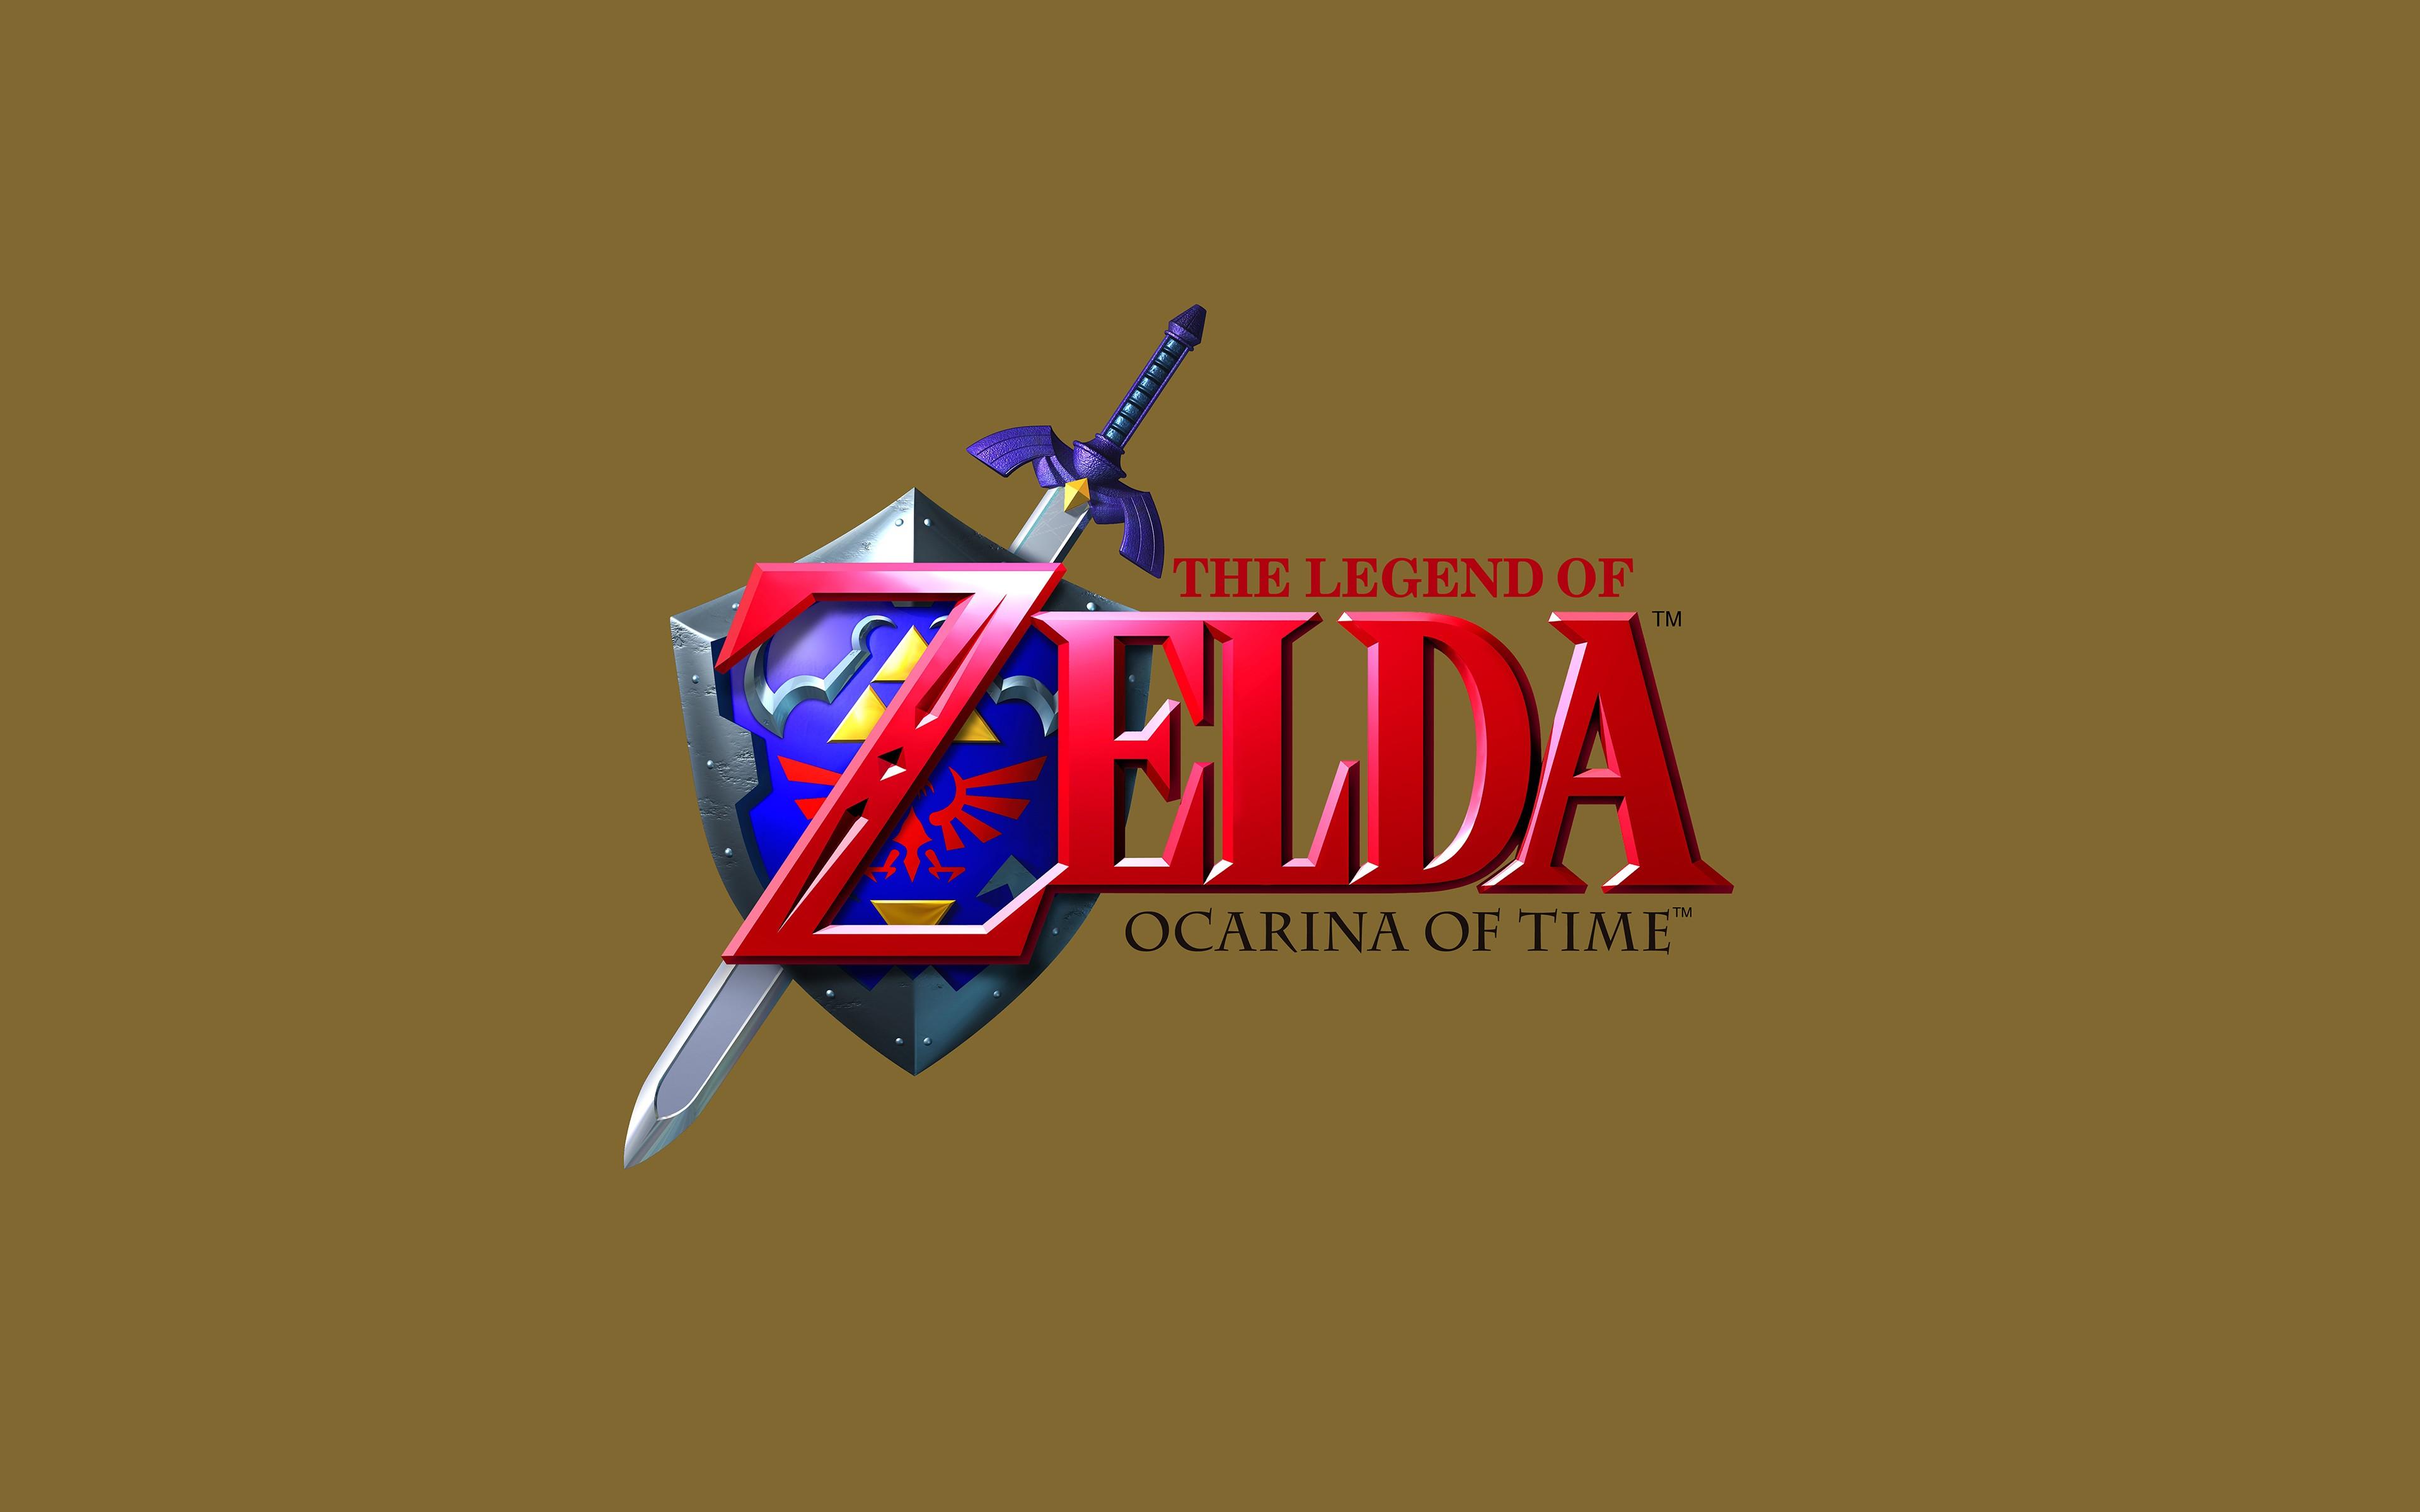 General 3840x2400 The Legend of Zelda: Ocarina of Time video games simple background retro games Master Sword Hylian Shield The Legend of Zelda